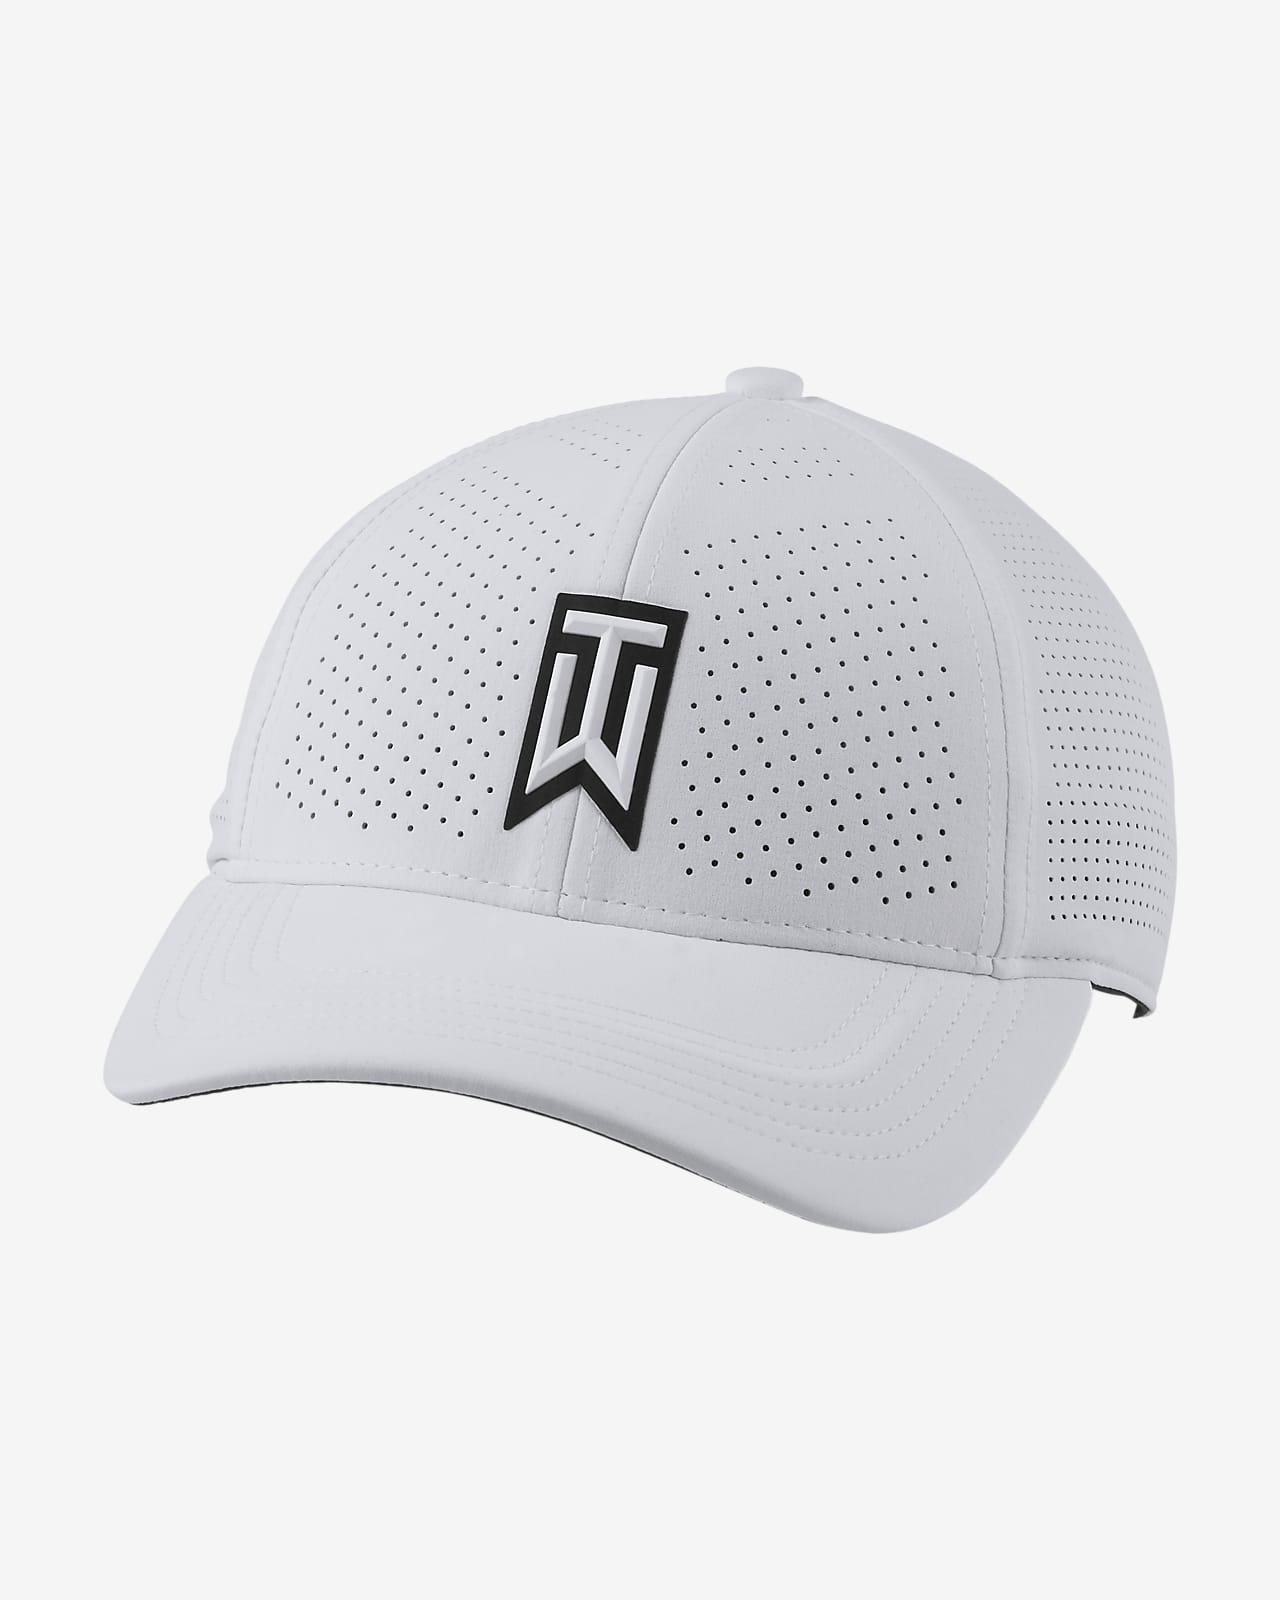 Nike AeroBill Tiger Woods Heritage86 perforierte Golf-Cap. Nike LU